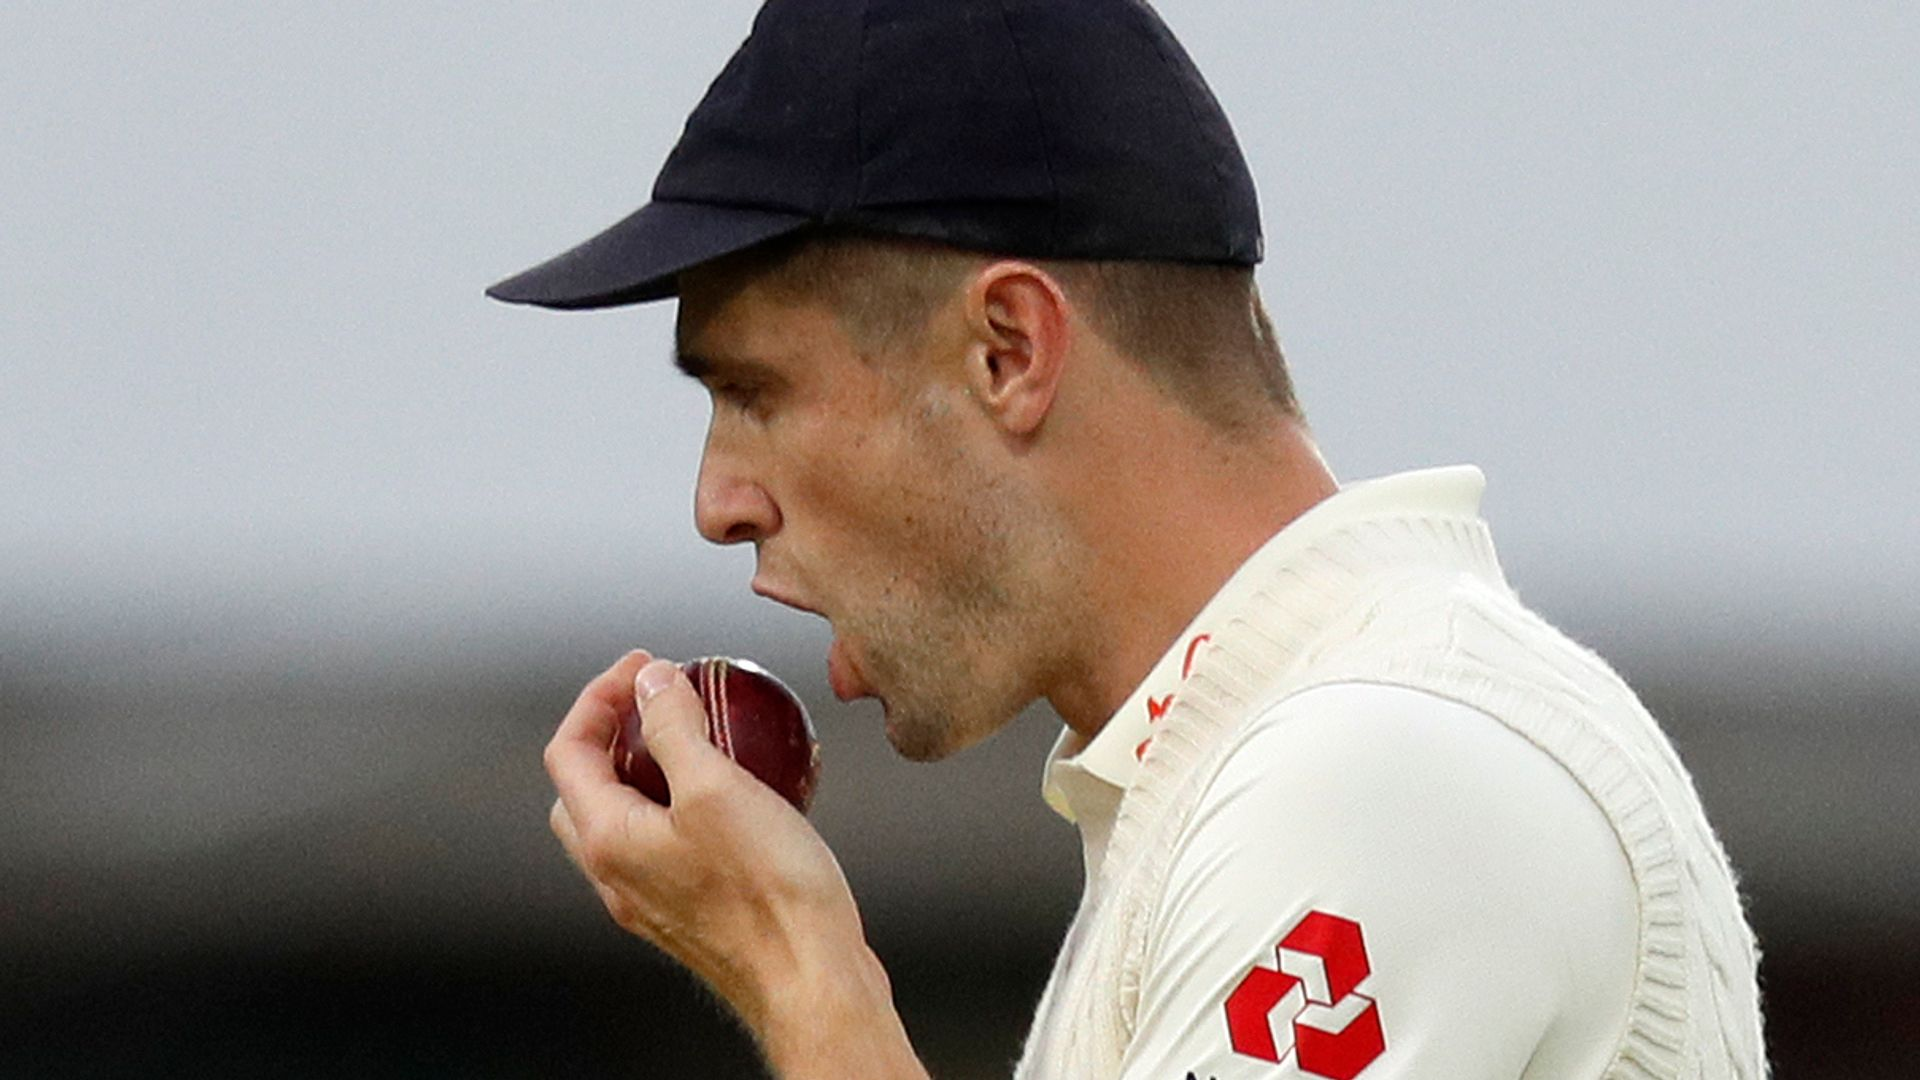 ICC proposes ban on polishing balls with saliva